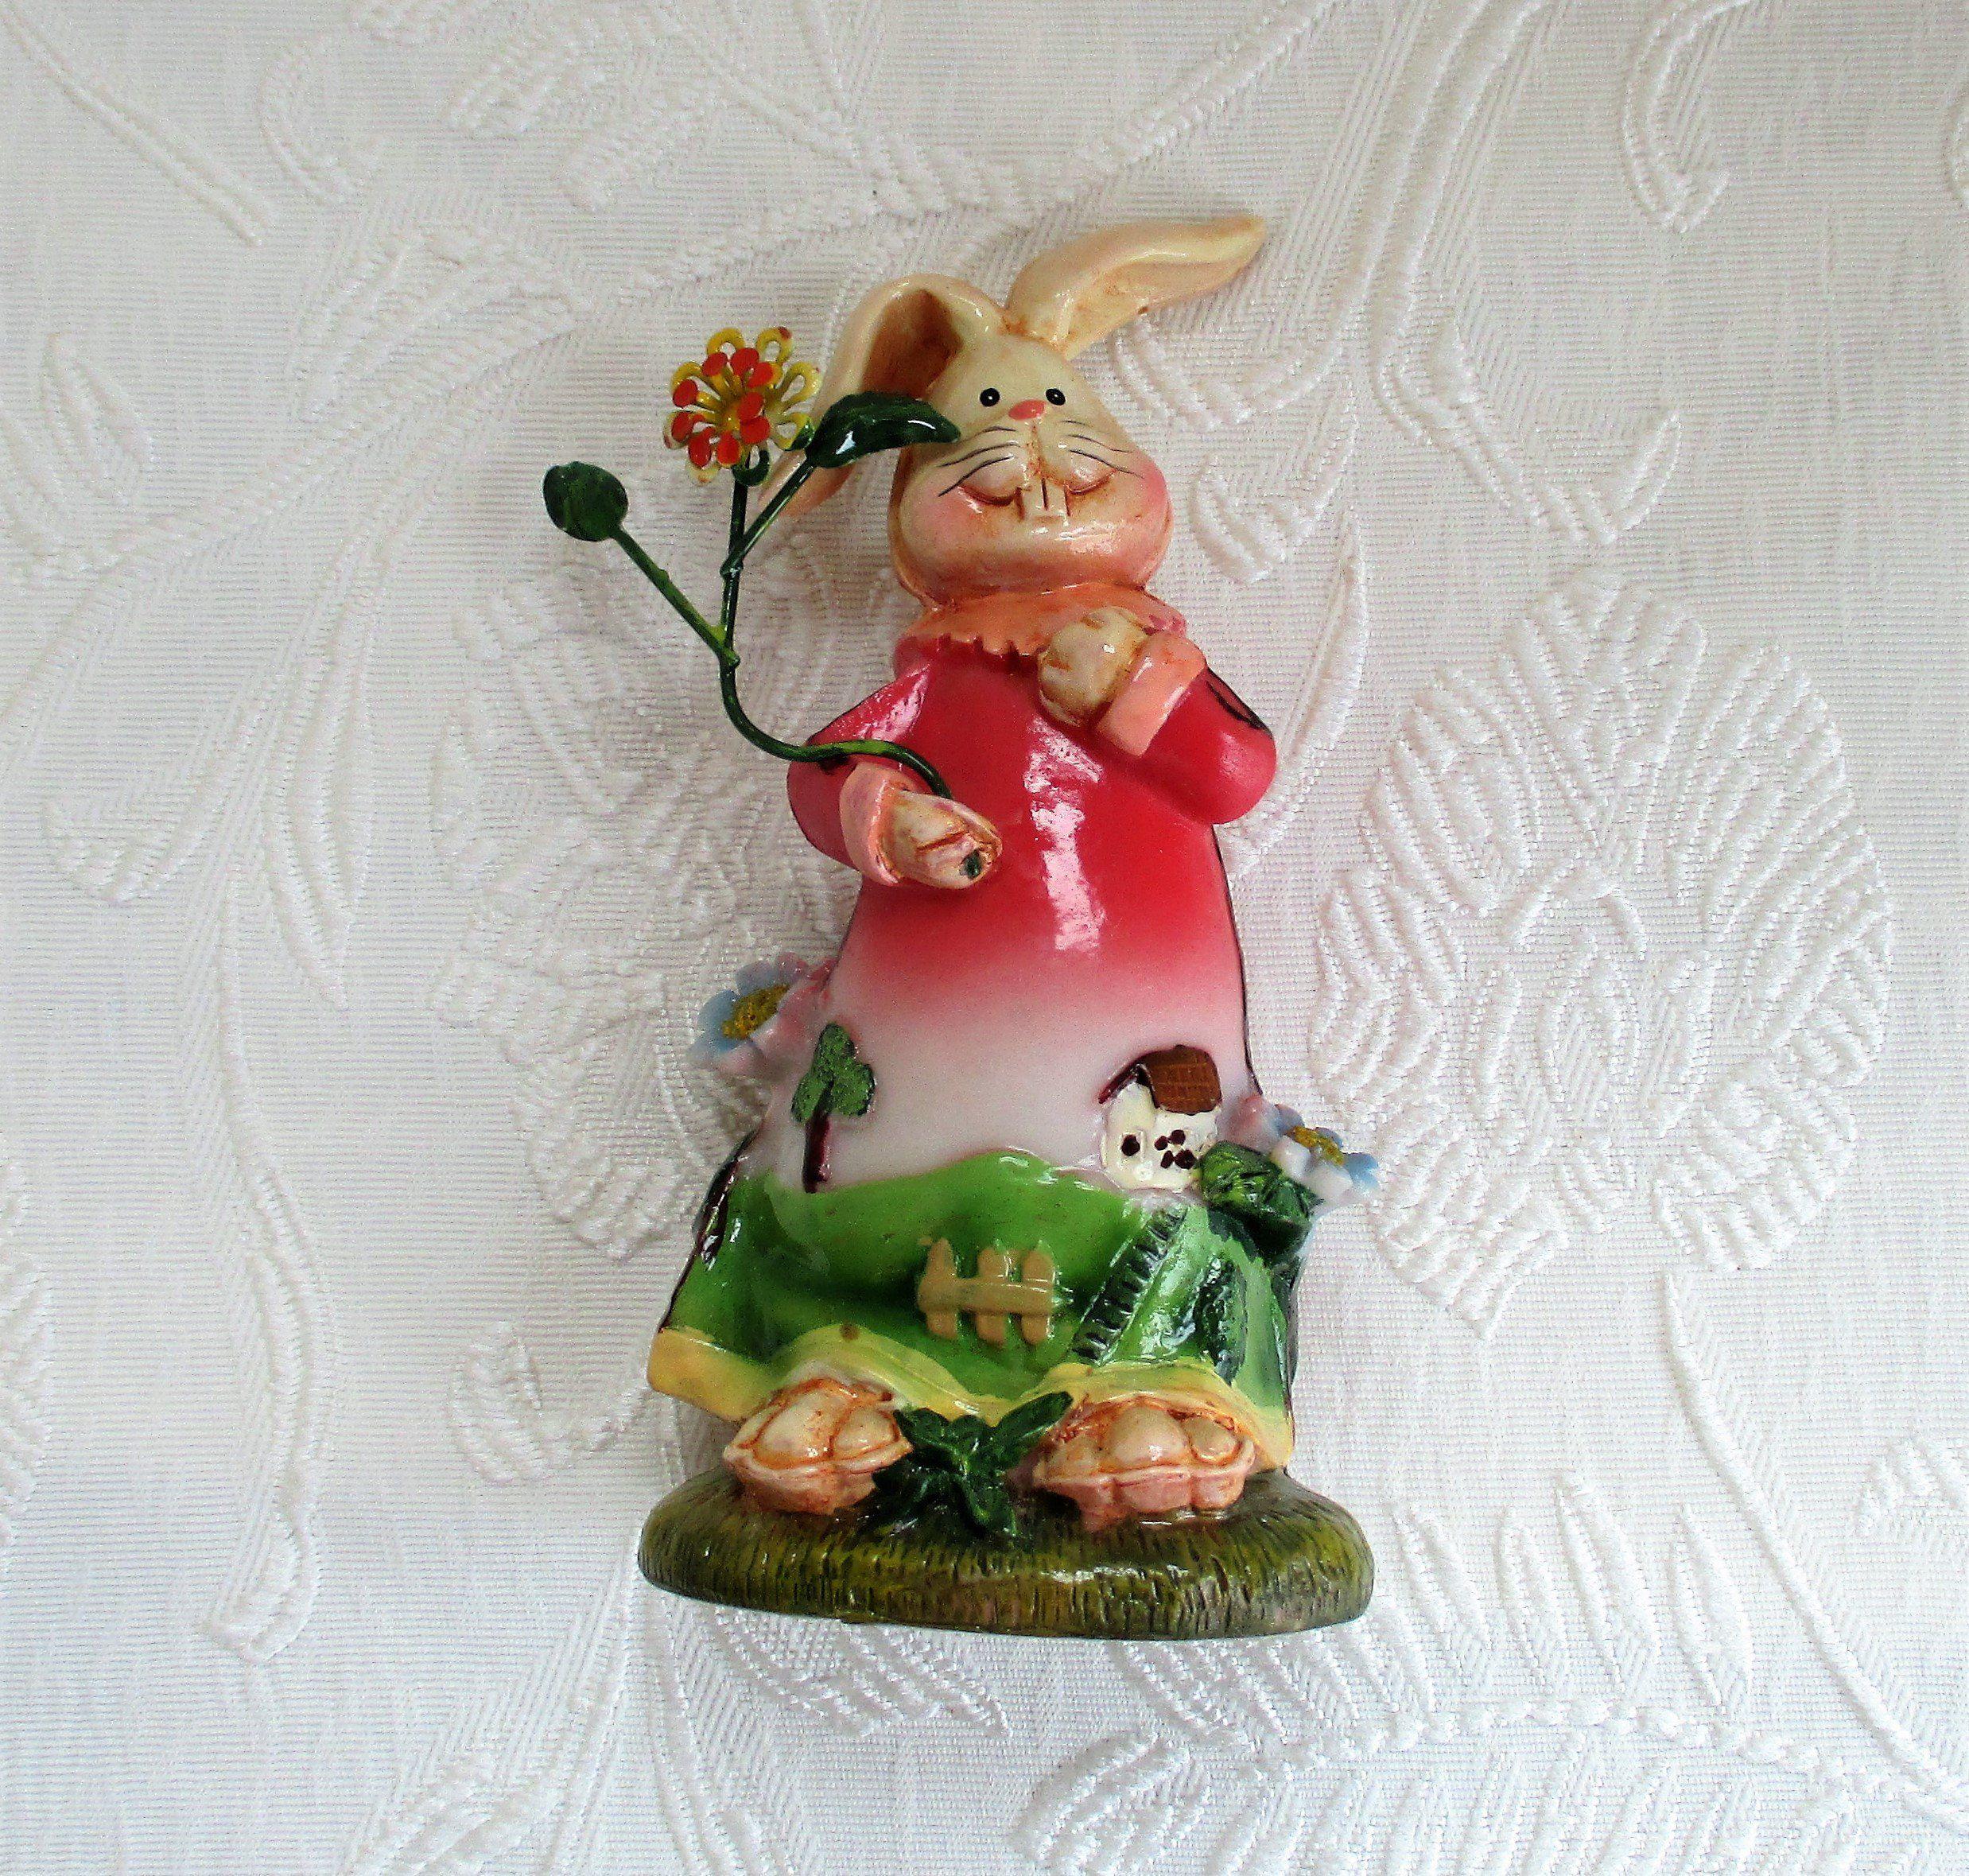 Easter Bunny Figurine Vintage Plastic Rabbit Easter Decor